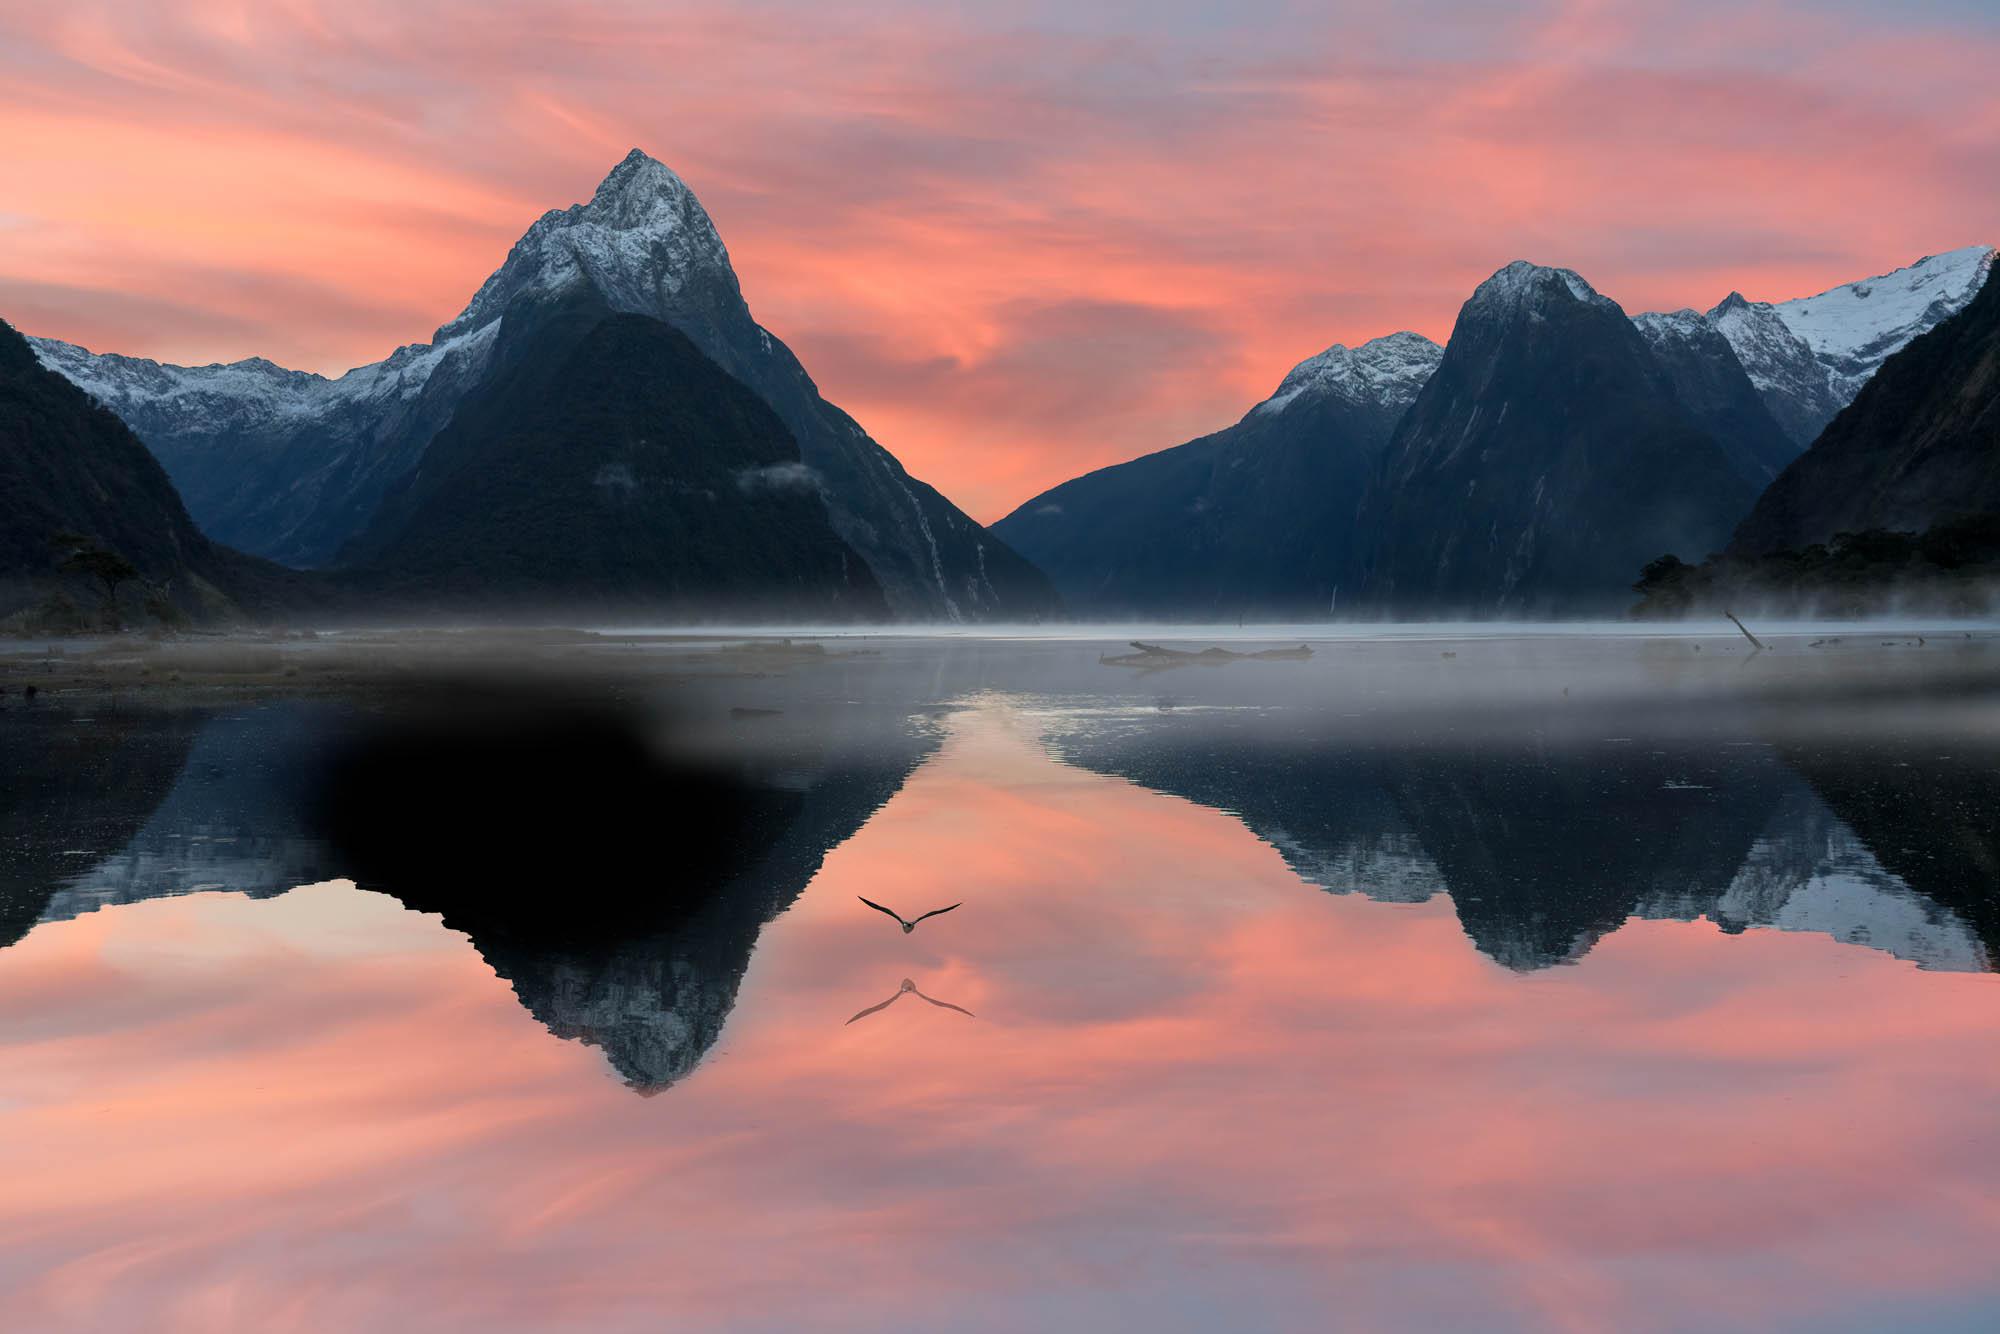 Sunrise at Milford Sound, New Zealand